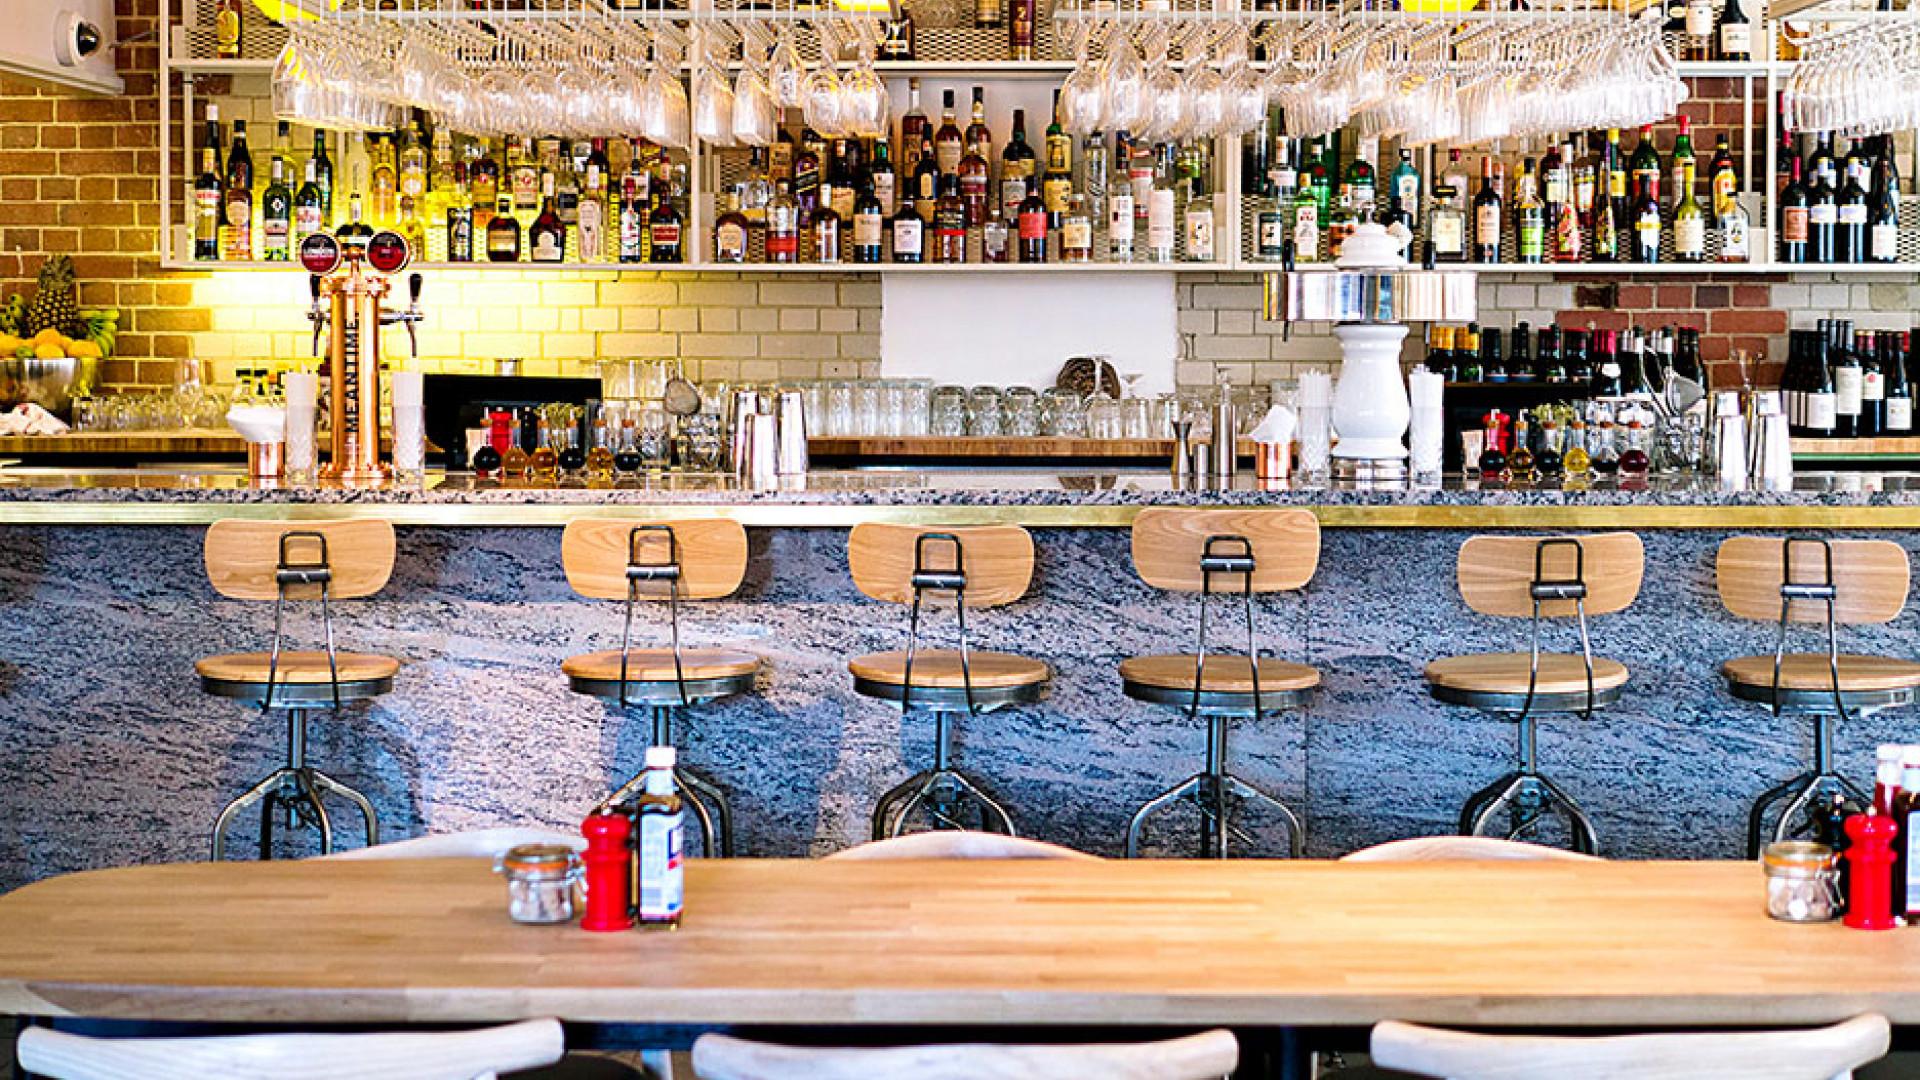 A sleek bar area